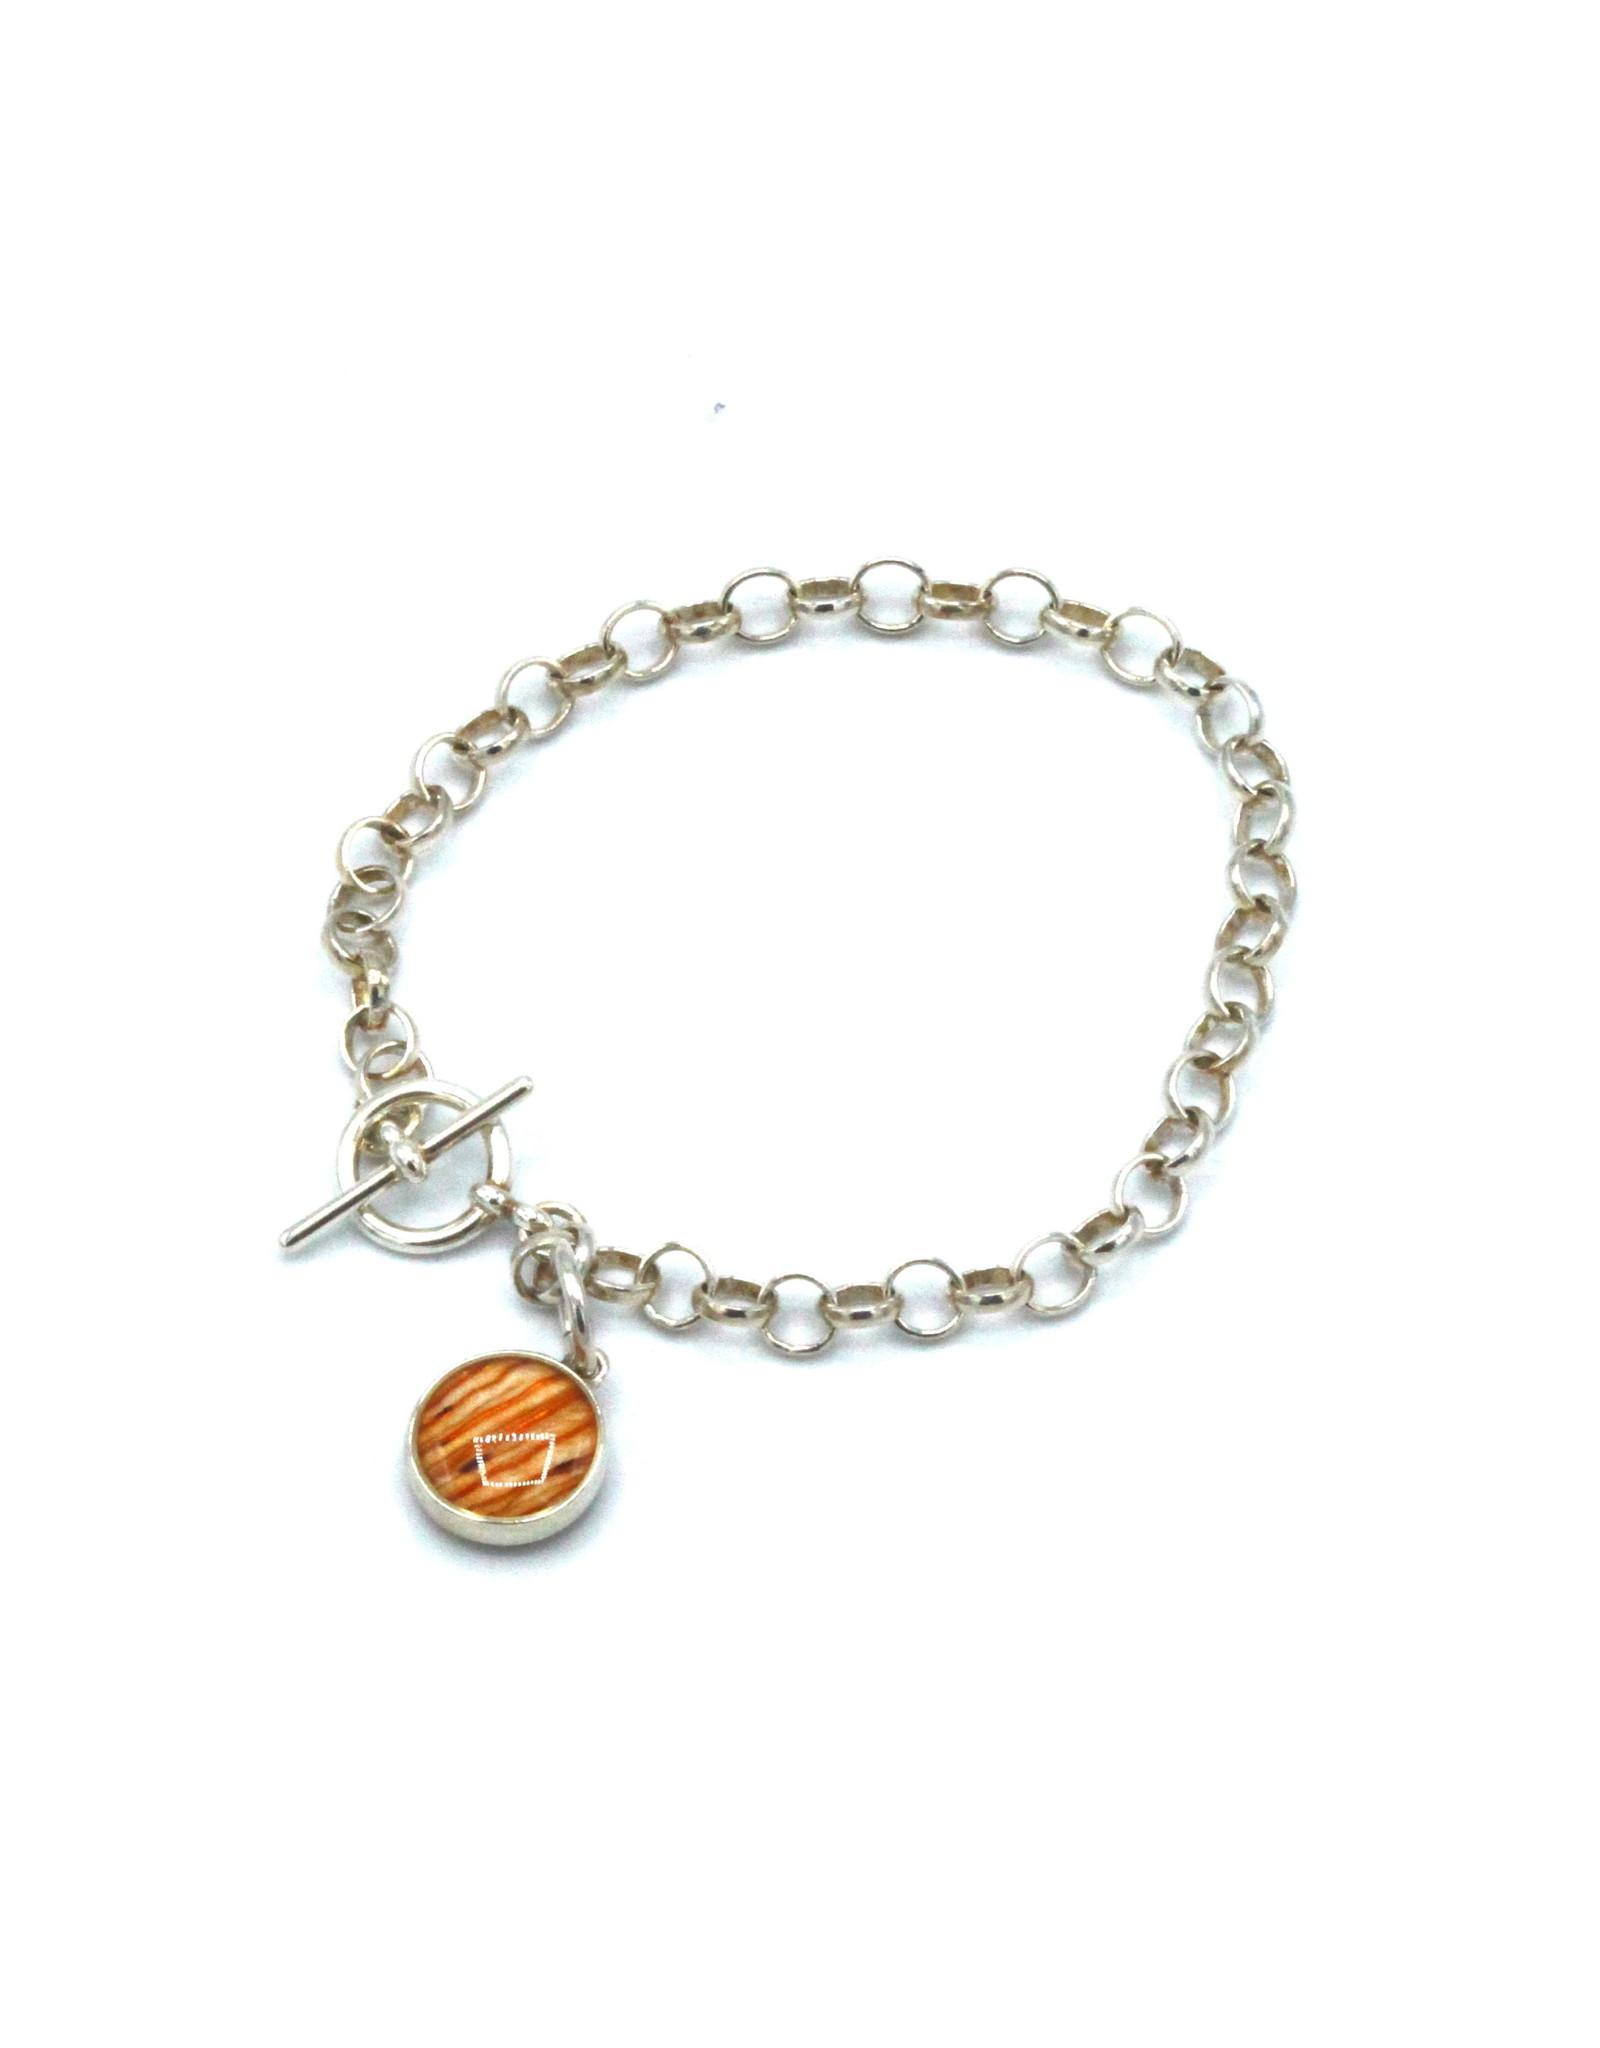 Saskatchewan Tiger Lily Toggle Silver Bracelet - SK02T